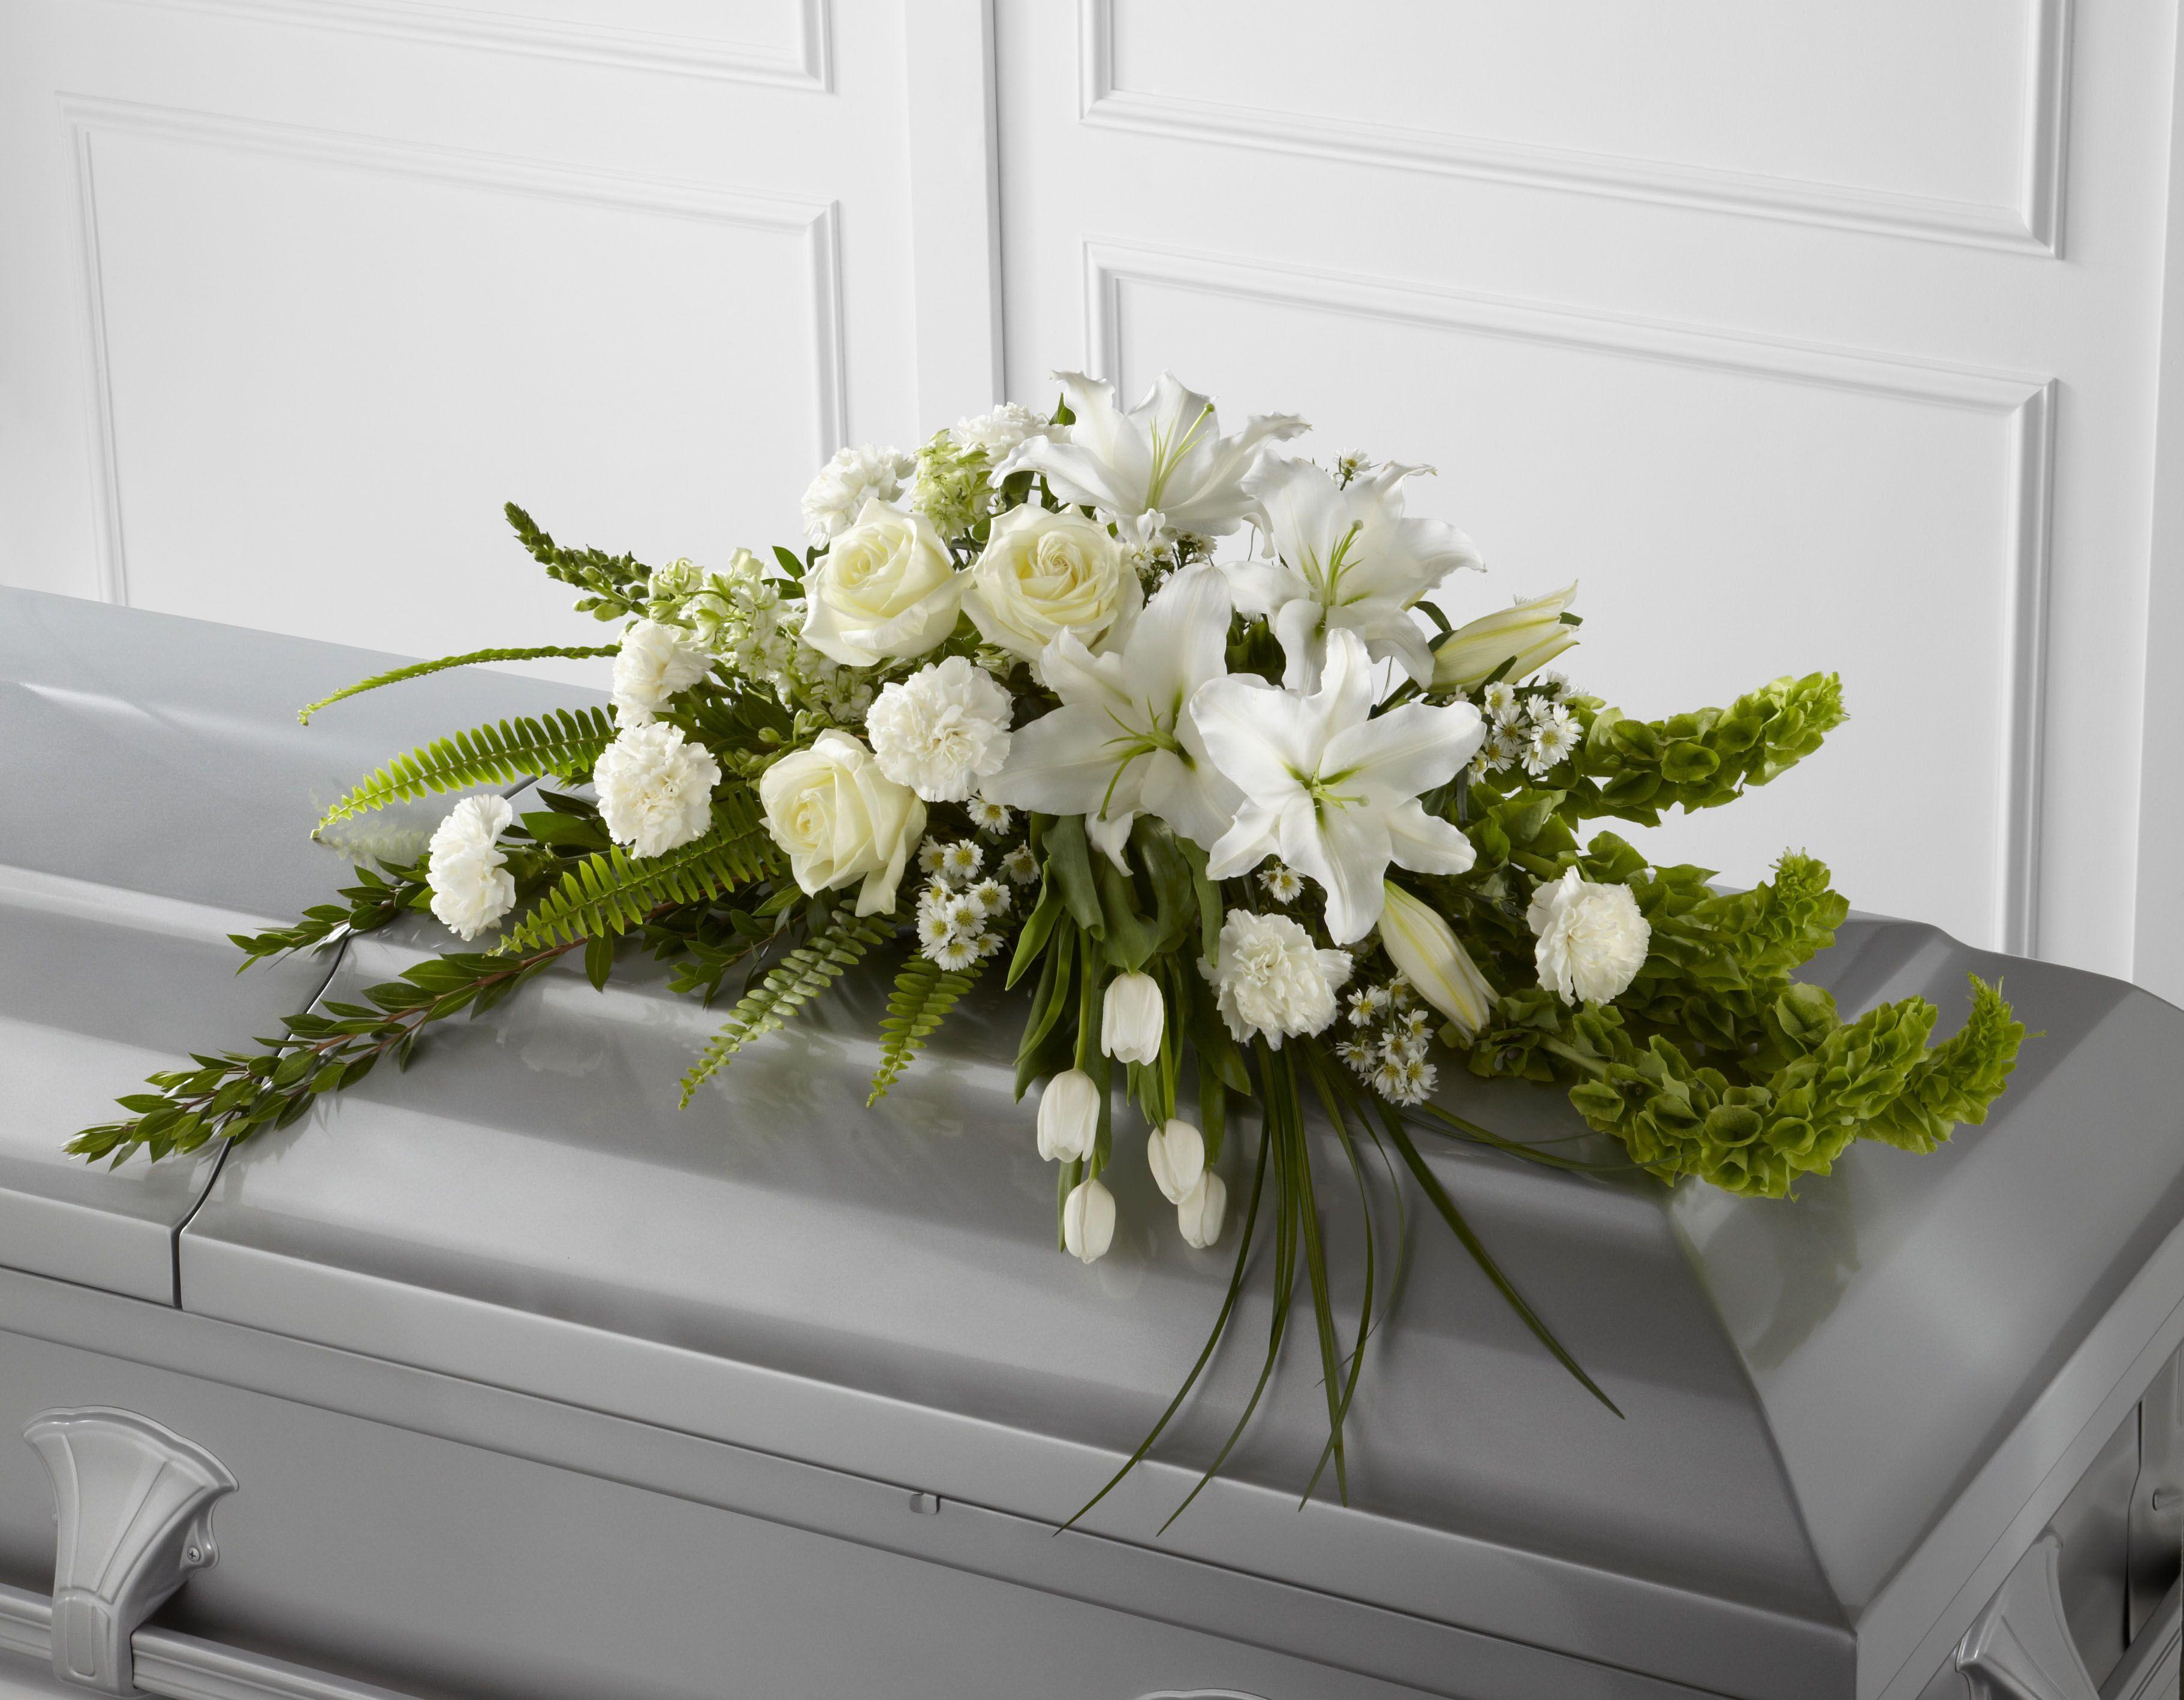 Casket sprays for men s8 4451g funeralsympathy arrangements casket sprays for men s8 4451g casket flowersfuneral izmirmasajfo Image collections